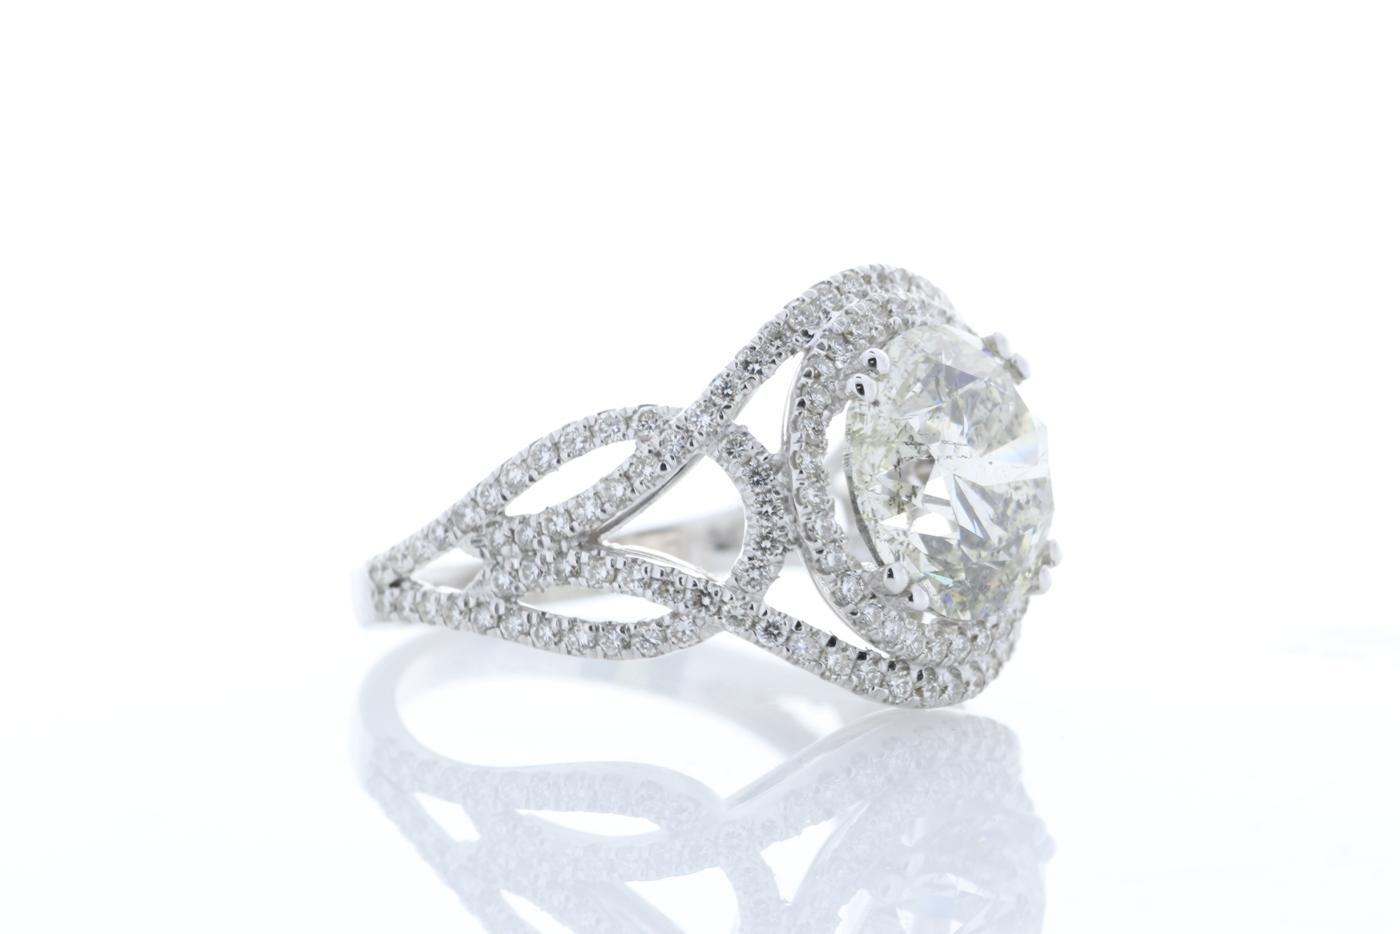 18k White Gold Single Stone With Halo Setting Ring 5.17 - Image 4 of 5